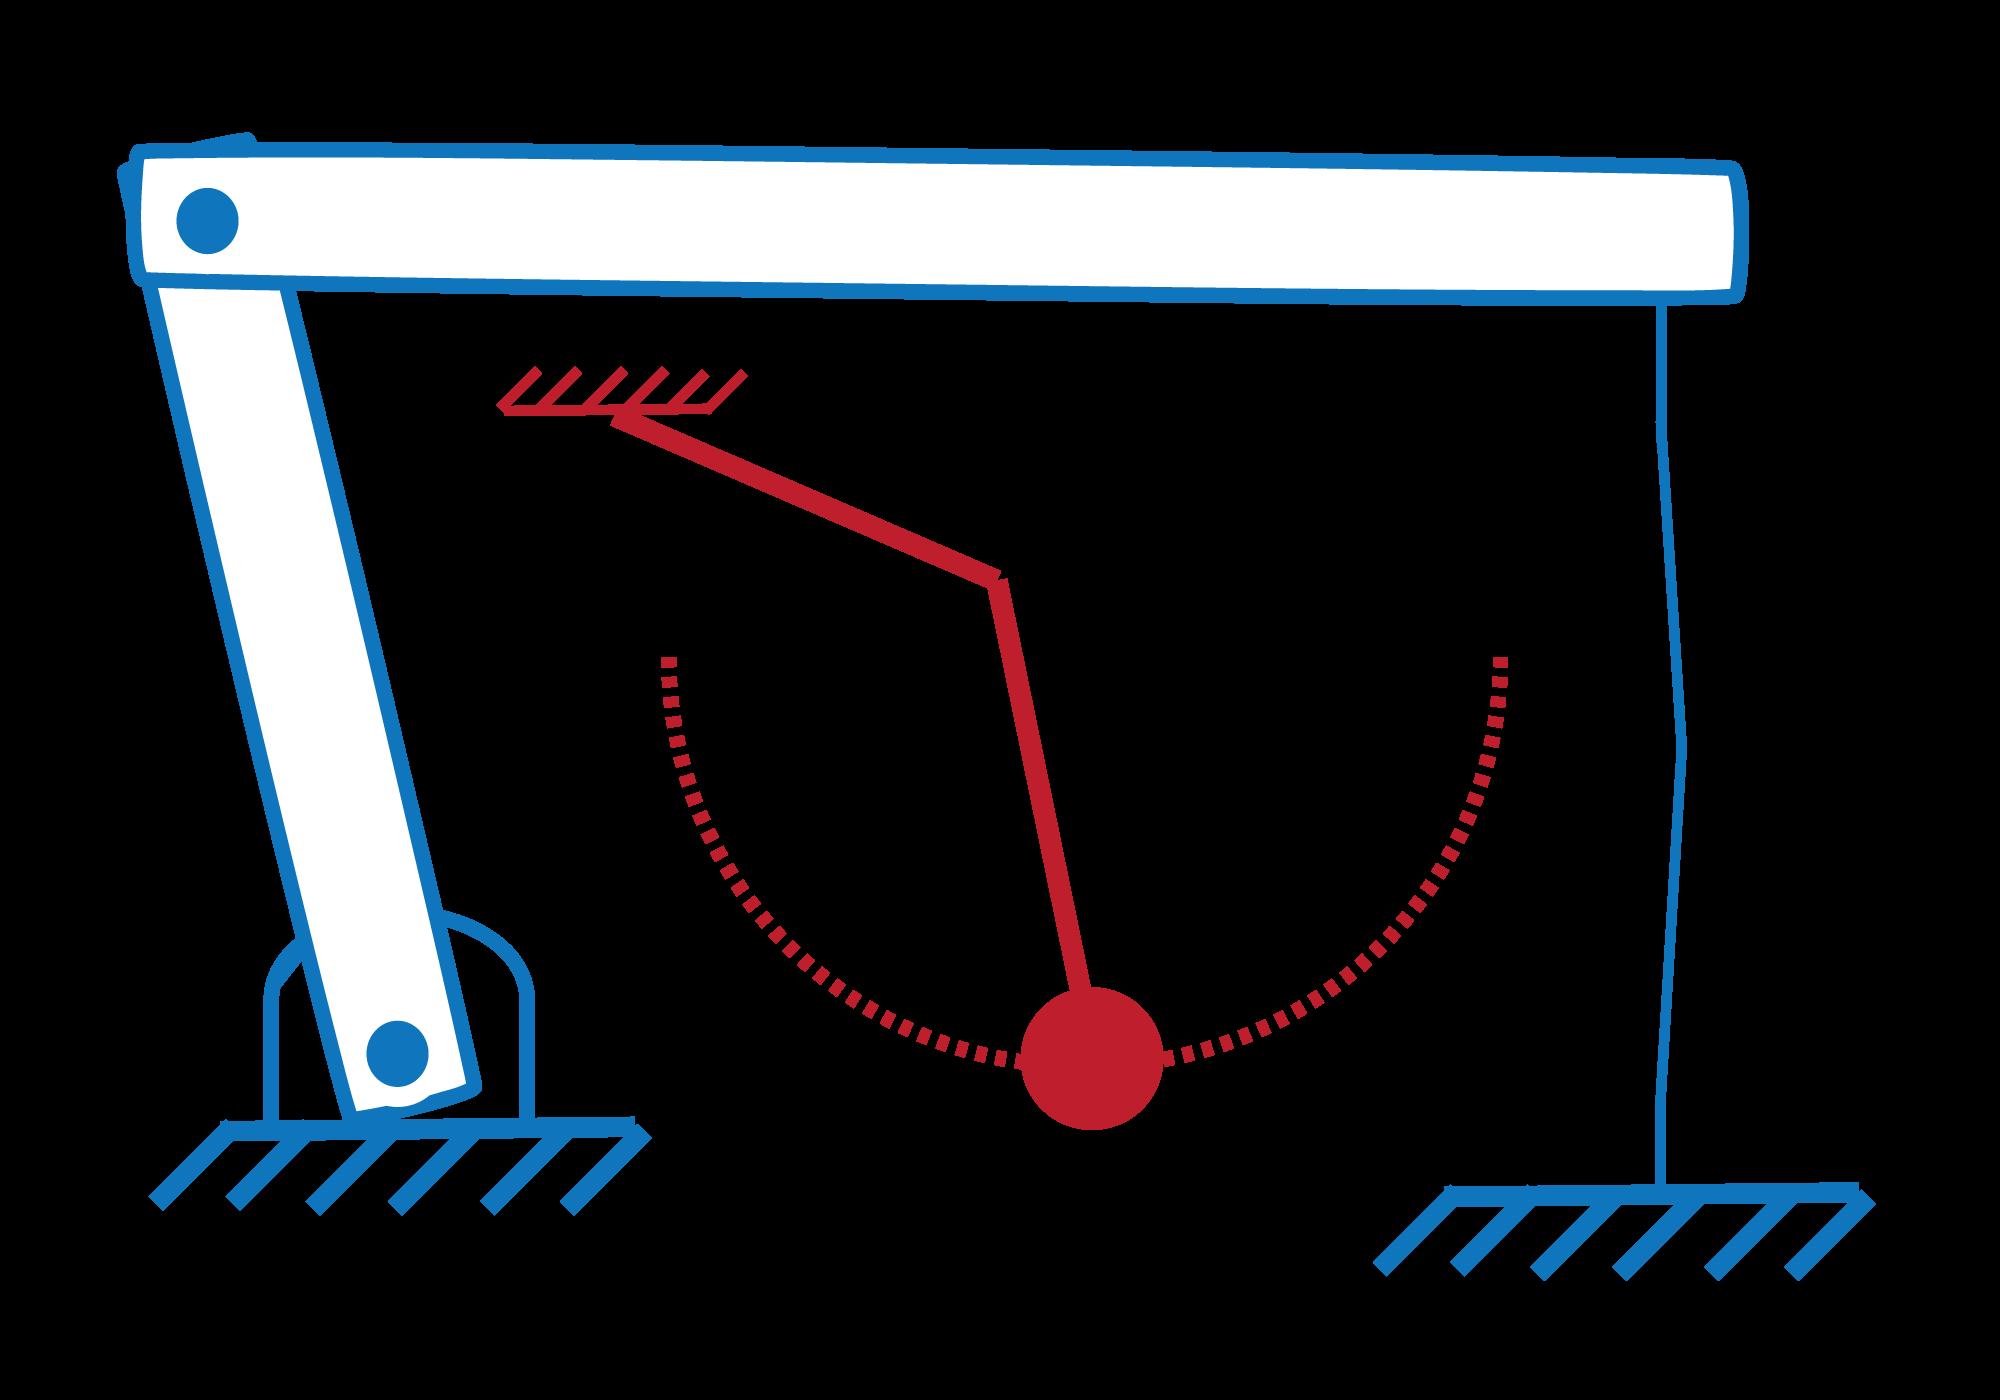 intermediate gui tutorial - file exchange - matlab central